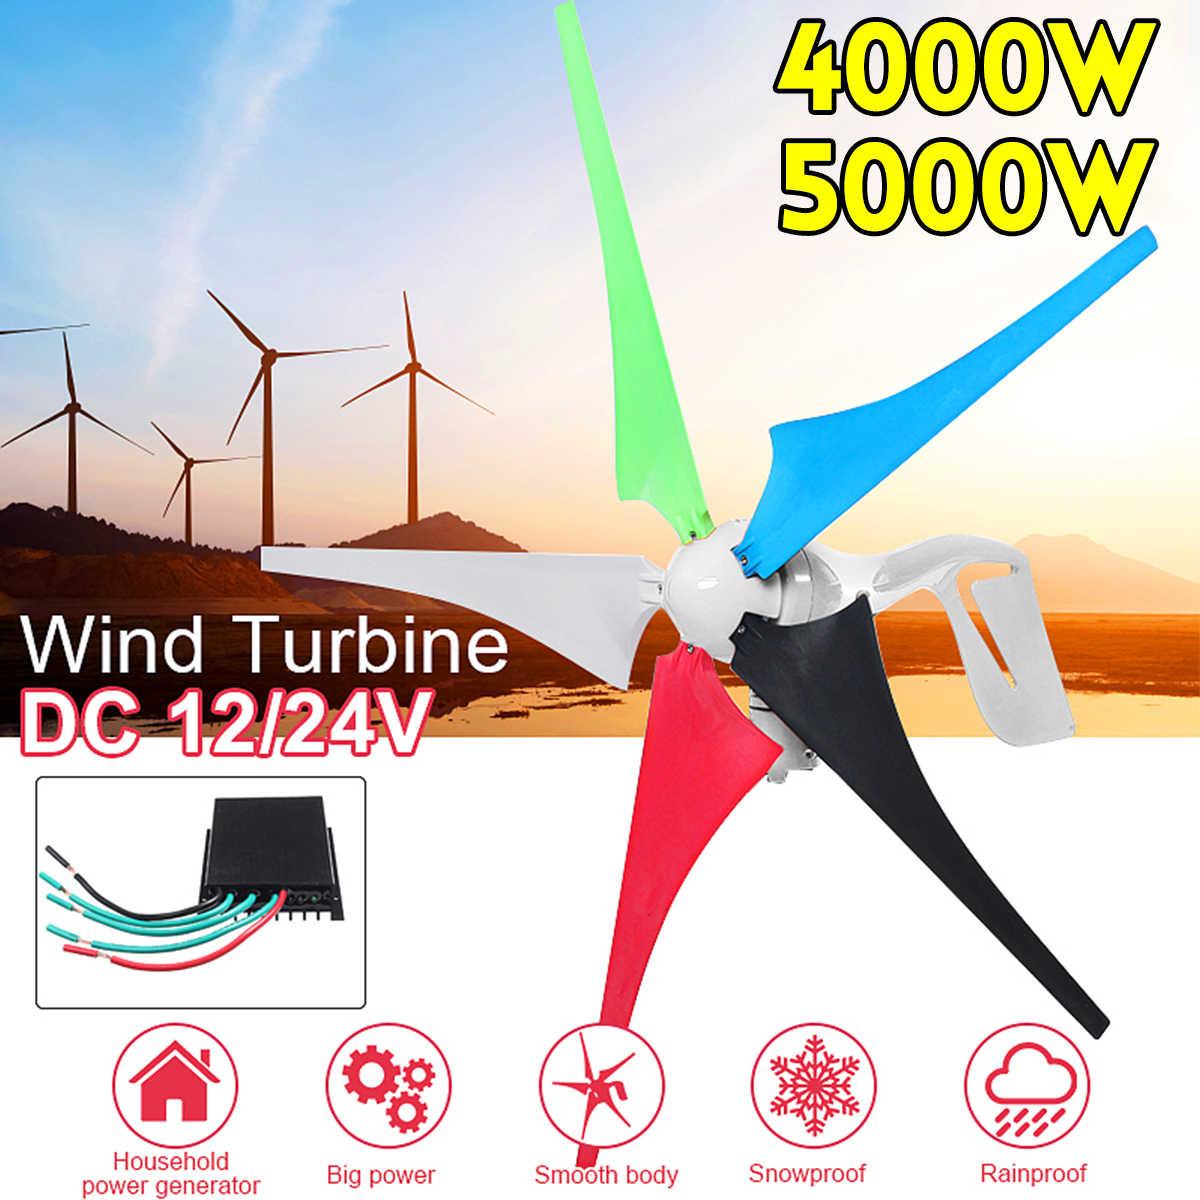 4000W 5000W Mini Angin Turbin Generator 5 Pisau + Angin Controller 12 V/24 V Fit Set rumah Tangga Power Supply Pemasangan Aksesoris